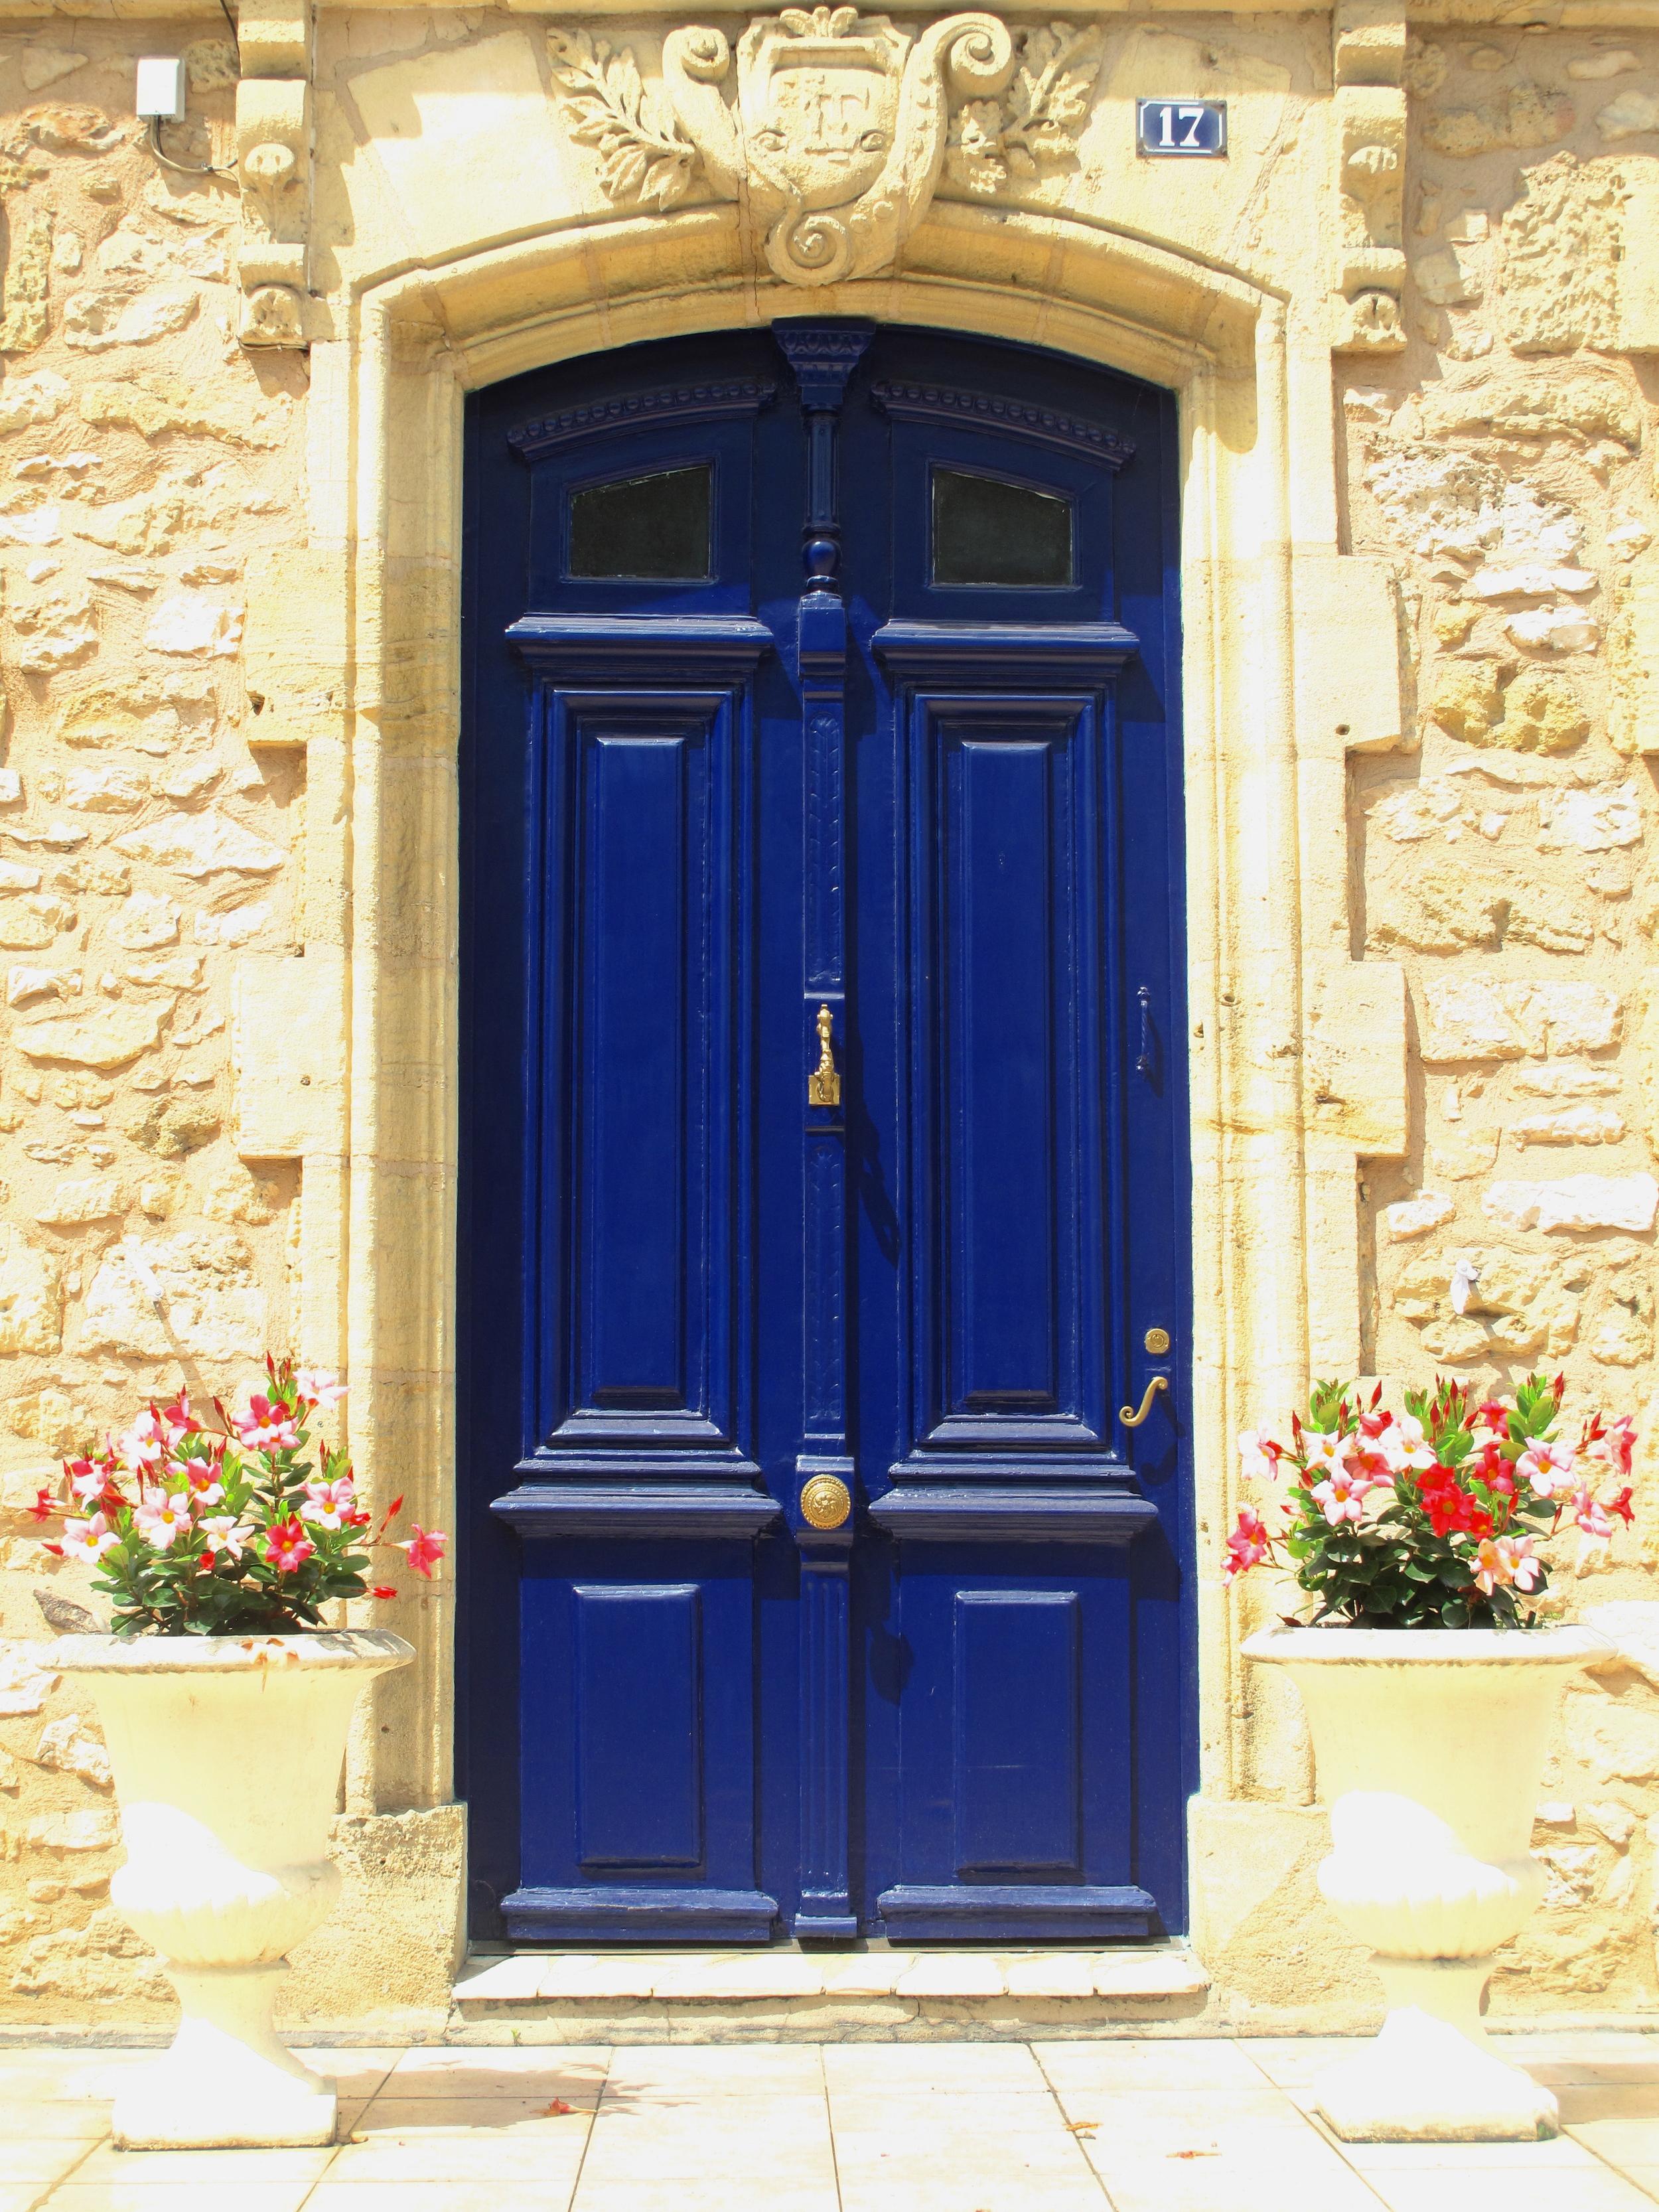 Blue doorway in a stone wall, Les Eyzies de Tayac, France.